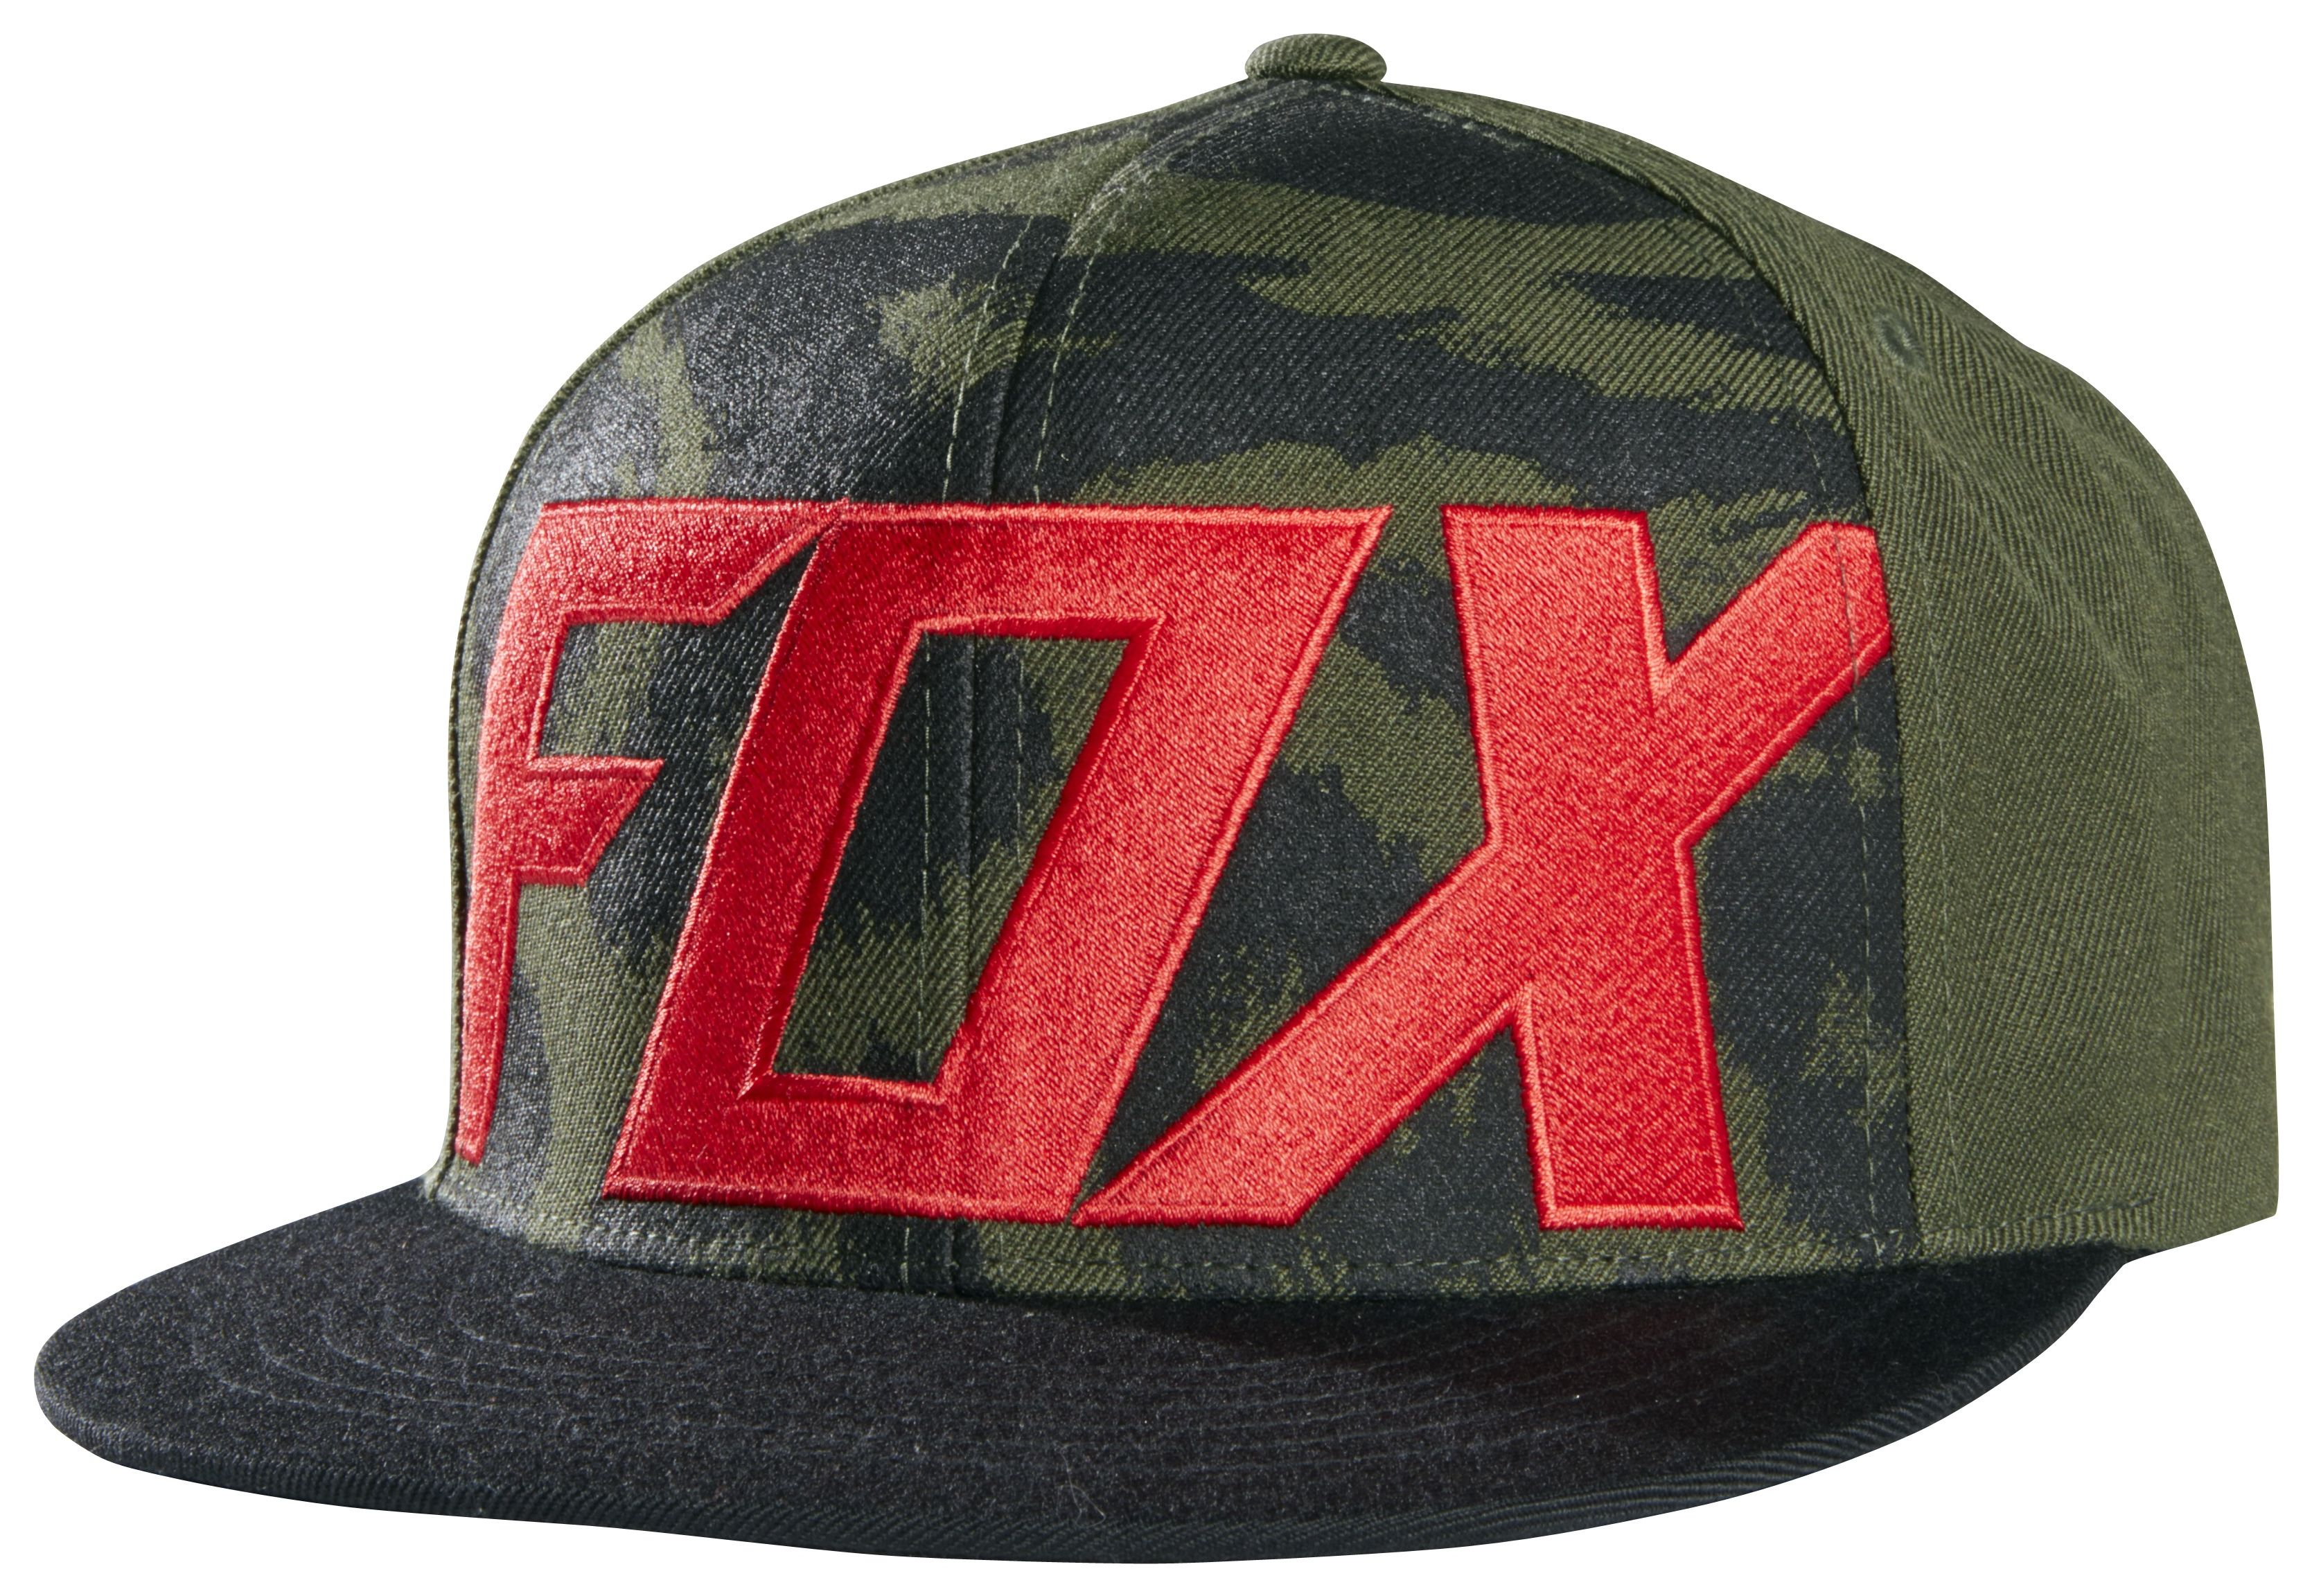 newest 37062 12818 ... reduced switzerland black fox racing hat b4141 0d20d 486ec 9e9d7